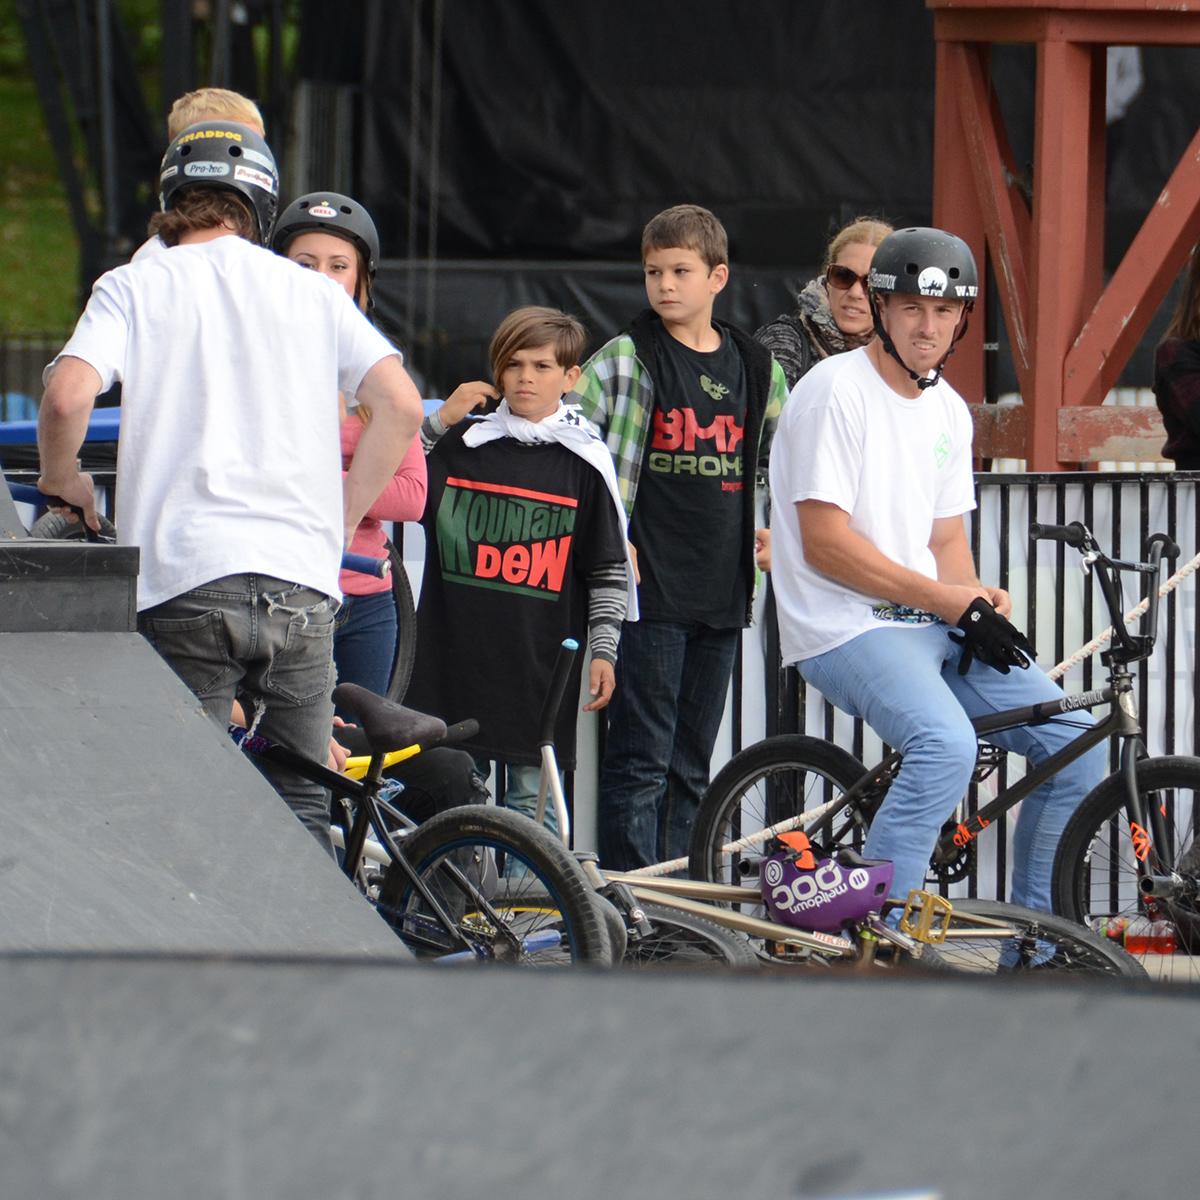 BMX Grom spectators at BMX Dew Tour Am Series in Toronto